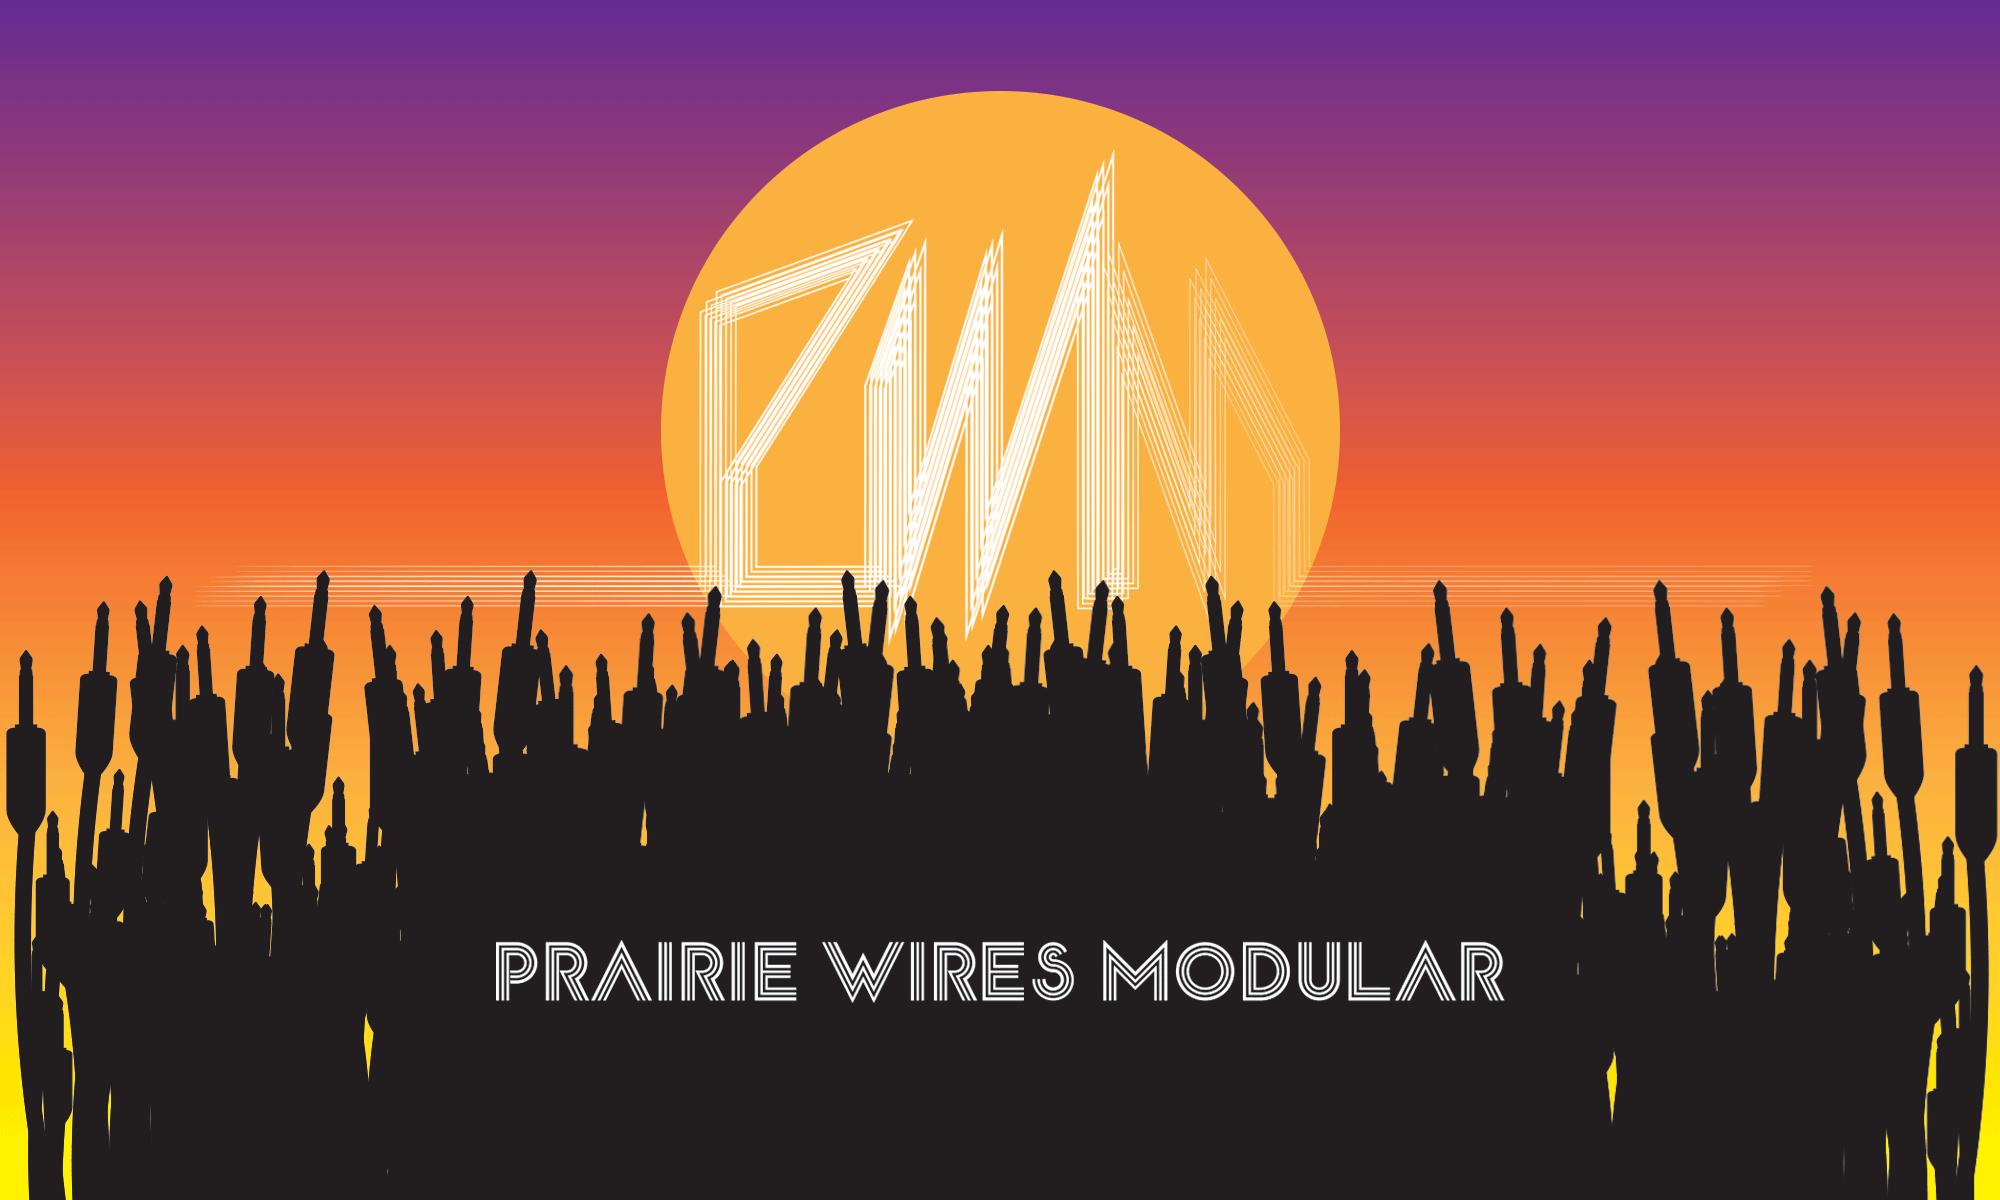 Prairie Wires Modular